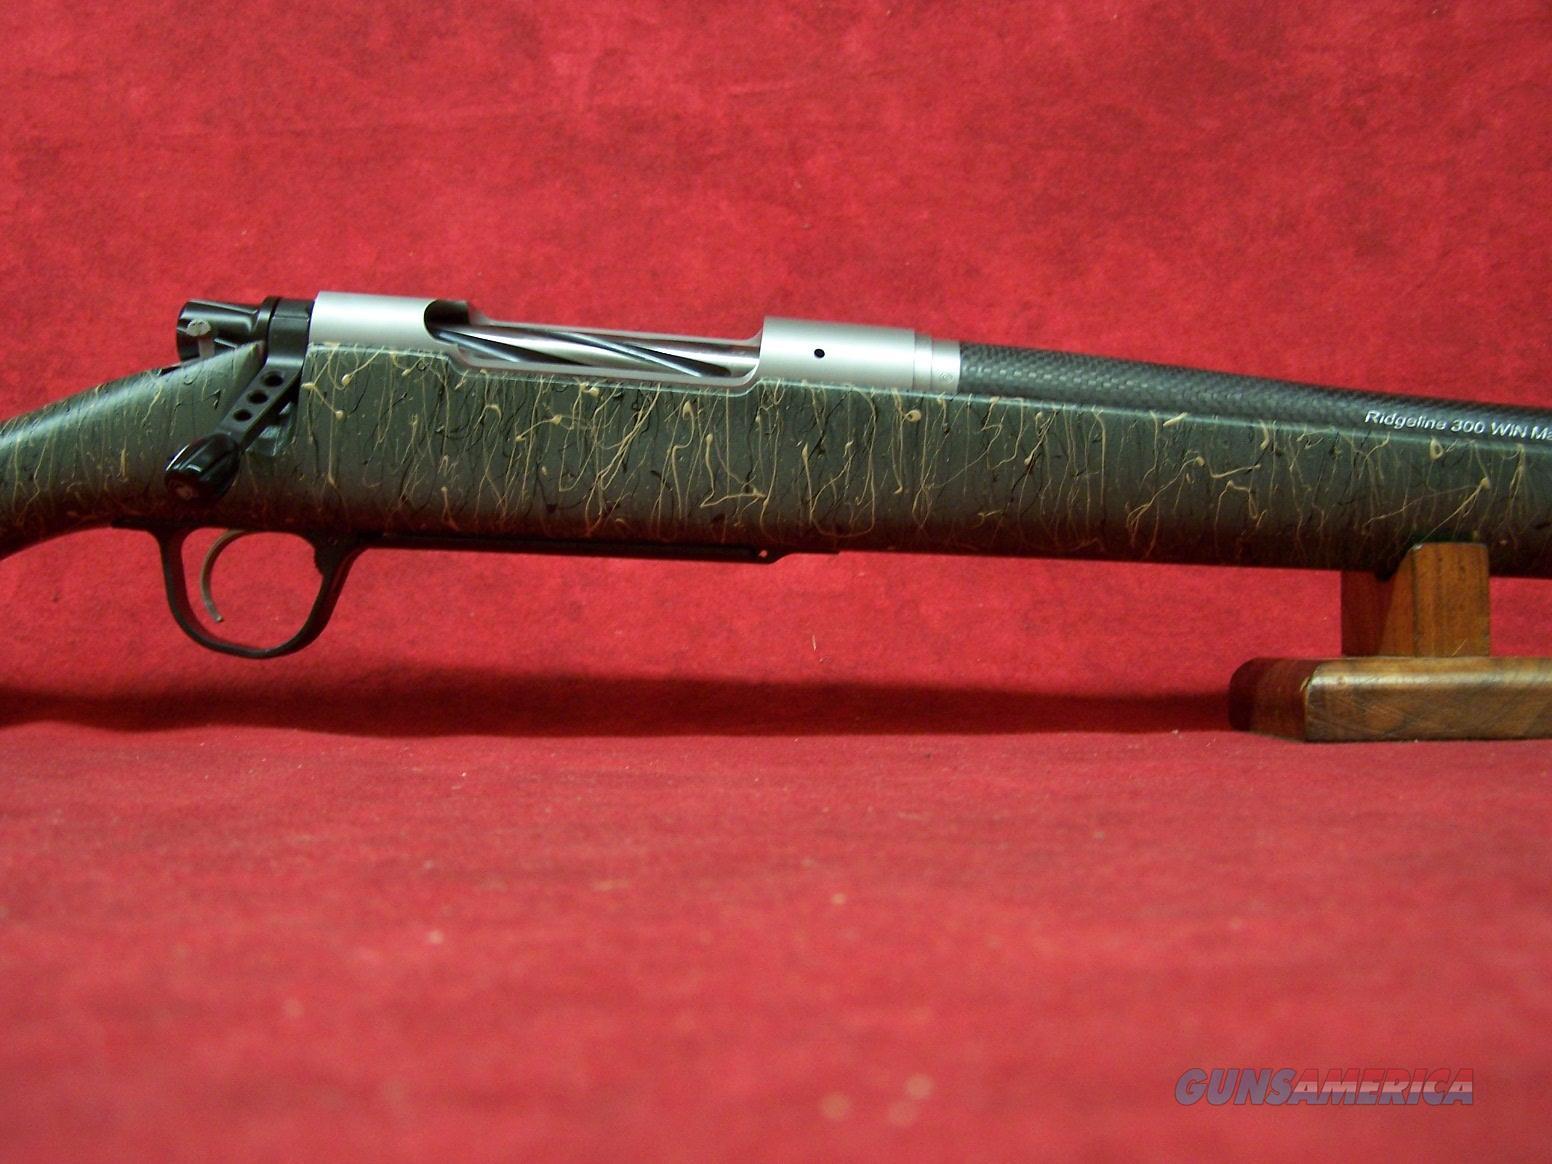 Christensen Arms Ridgeline .300 Win Mag Green/Black    Guns > Rifles > C Misc Rifles